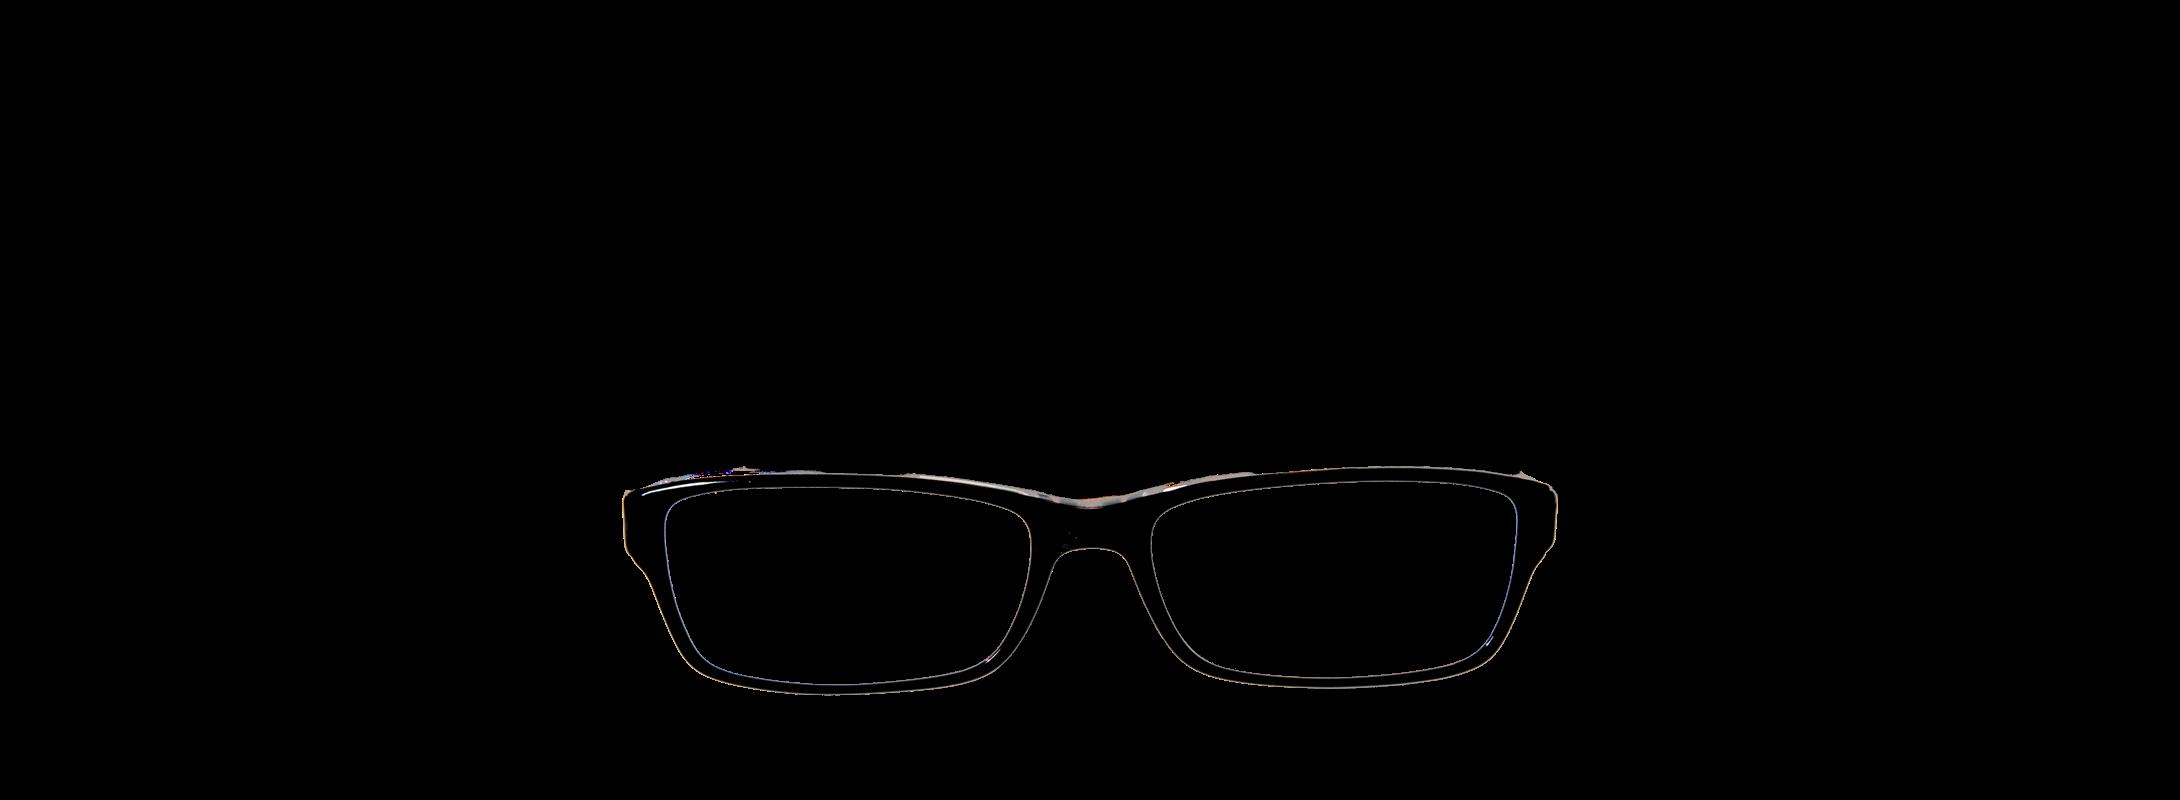 http://static.tumblr.com/47a32cdac34899fea552cb47e8a673a3/rktmfma/SuJmvqz30/tumblr_static_i_wear_glasses.png